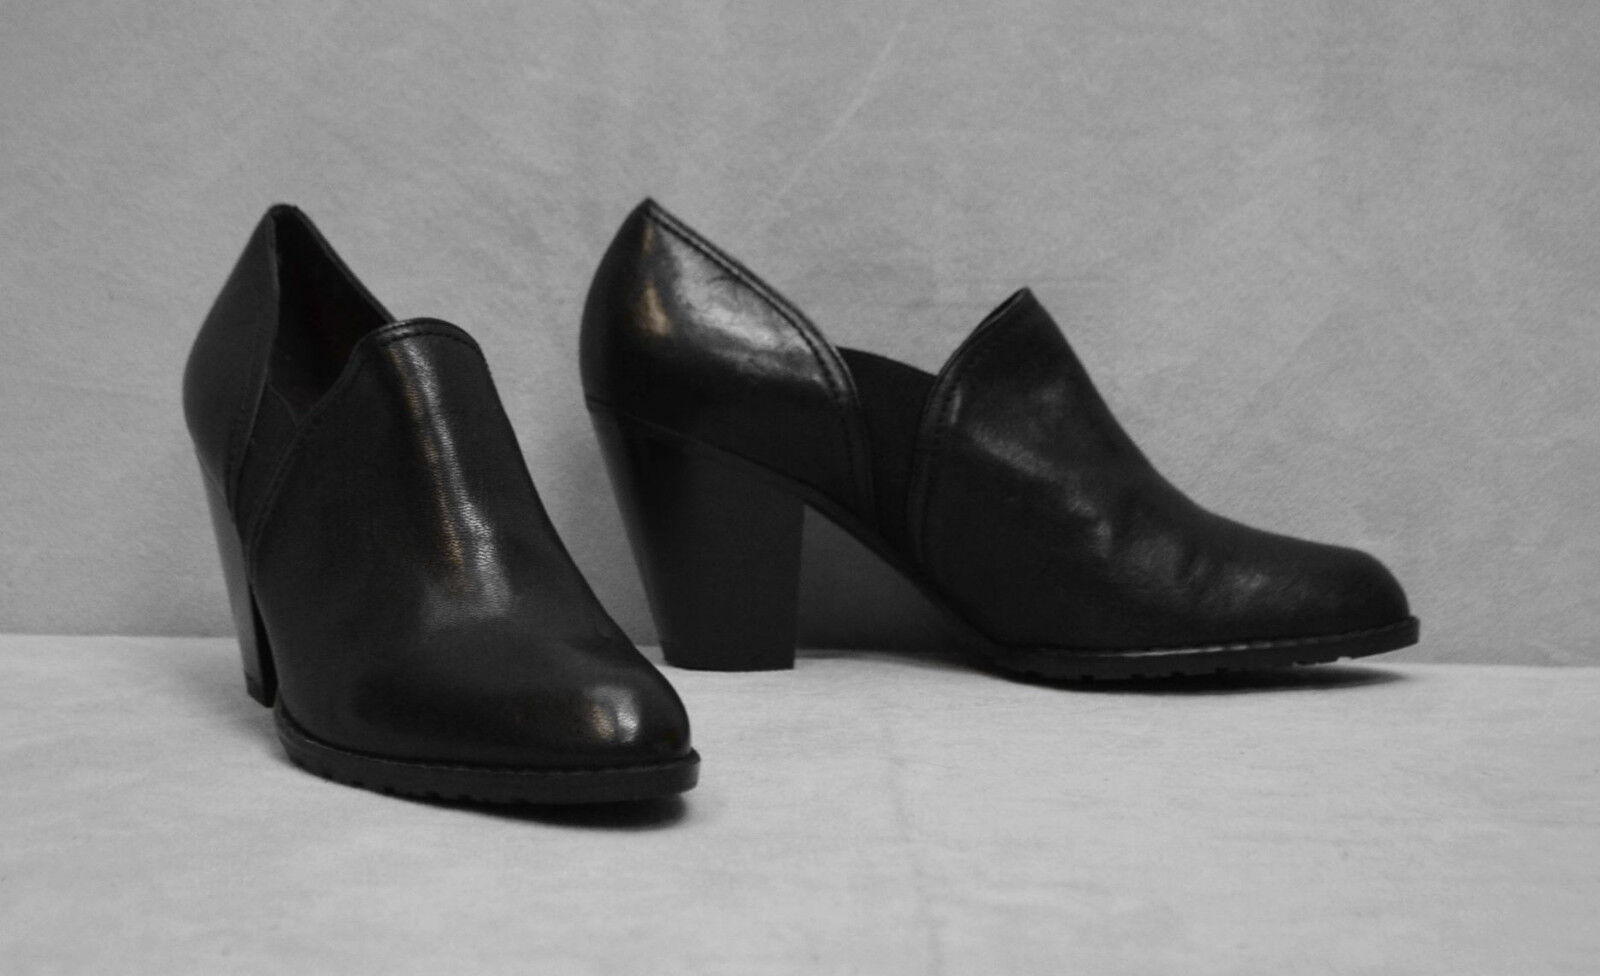 B2 Auth STUART WEITZMAN Black Leather Block Heel Bootie Pump shoes Size 7 M